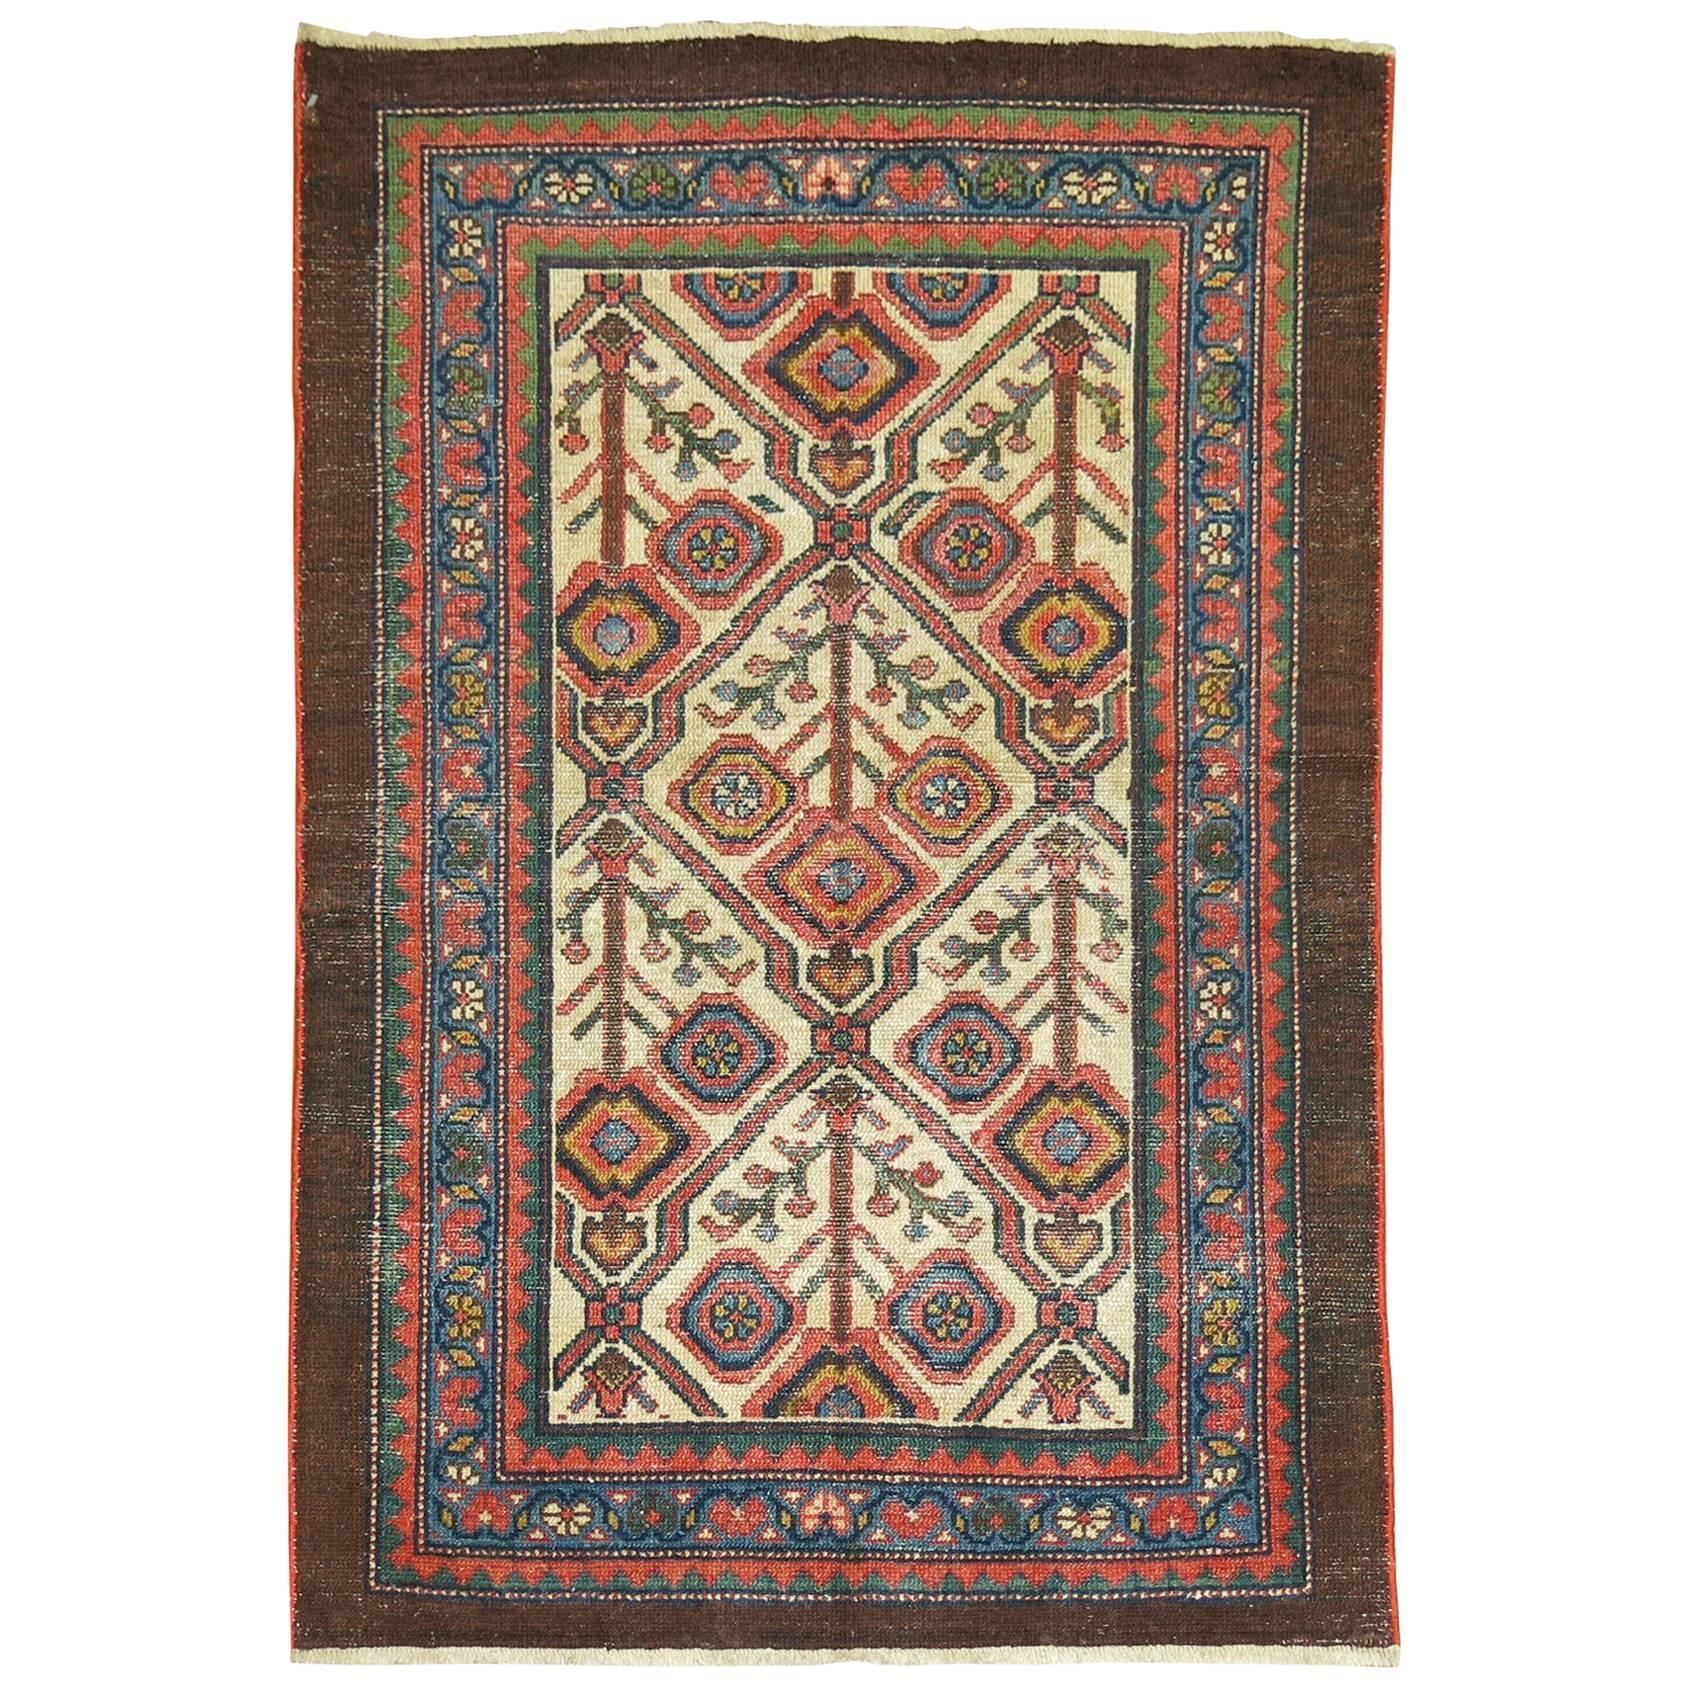 Antique Persian Serab Decorative Rug Mat